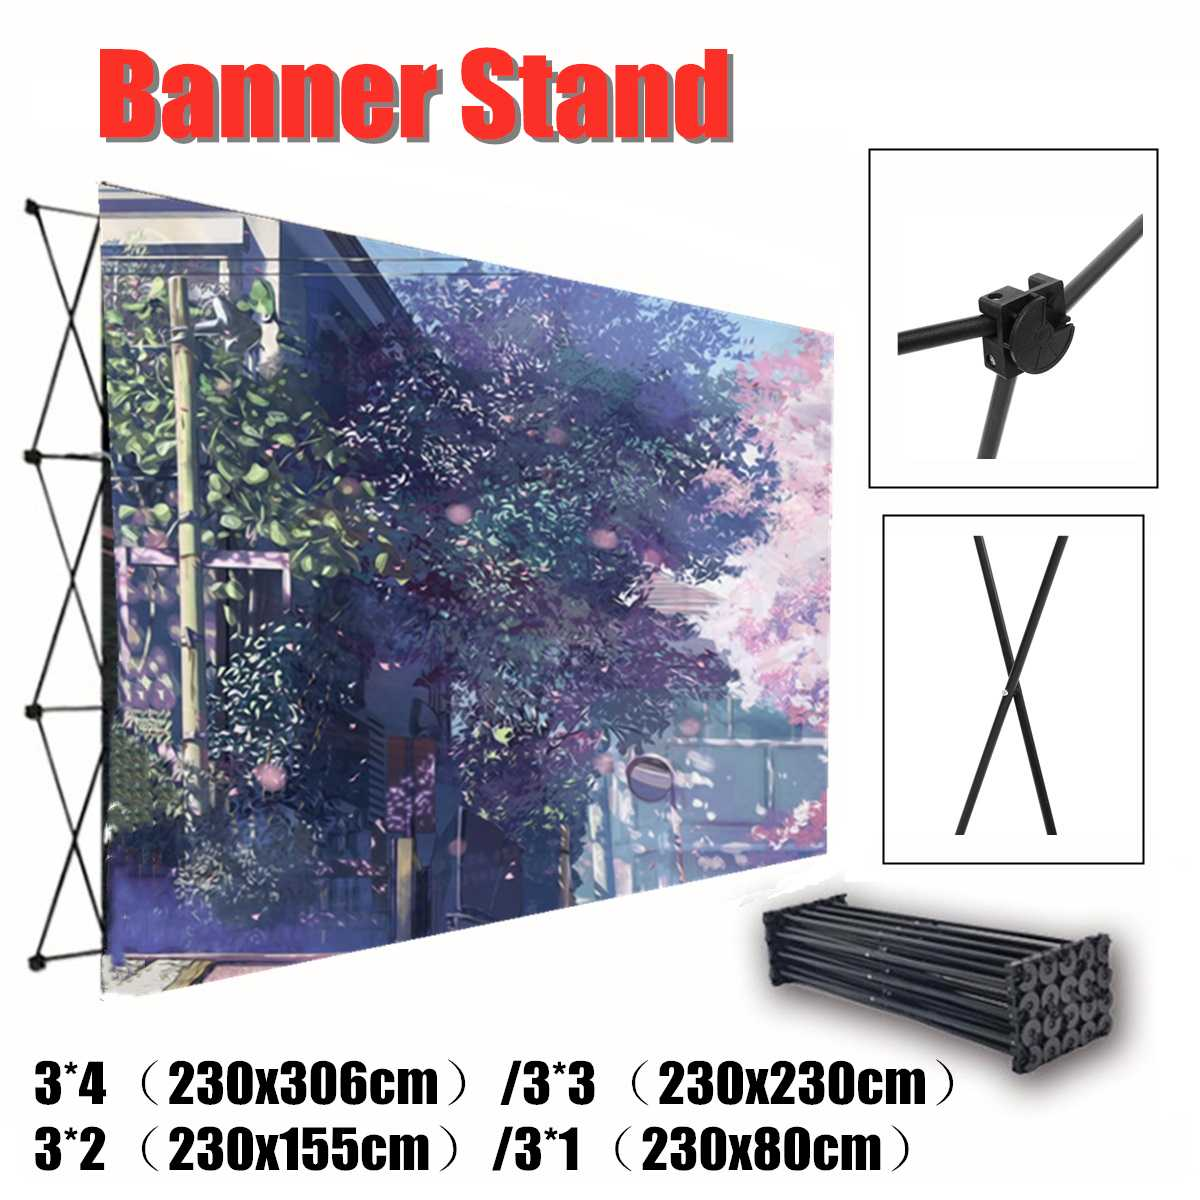 4 tamaños de aluminio flor pared plegable soporte marco boda telón de fondo decoración Banner presentación anuncio soporte de exhibición